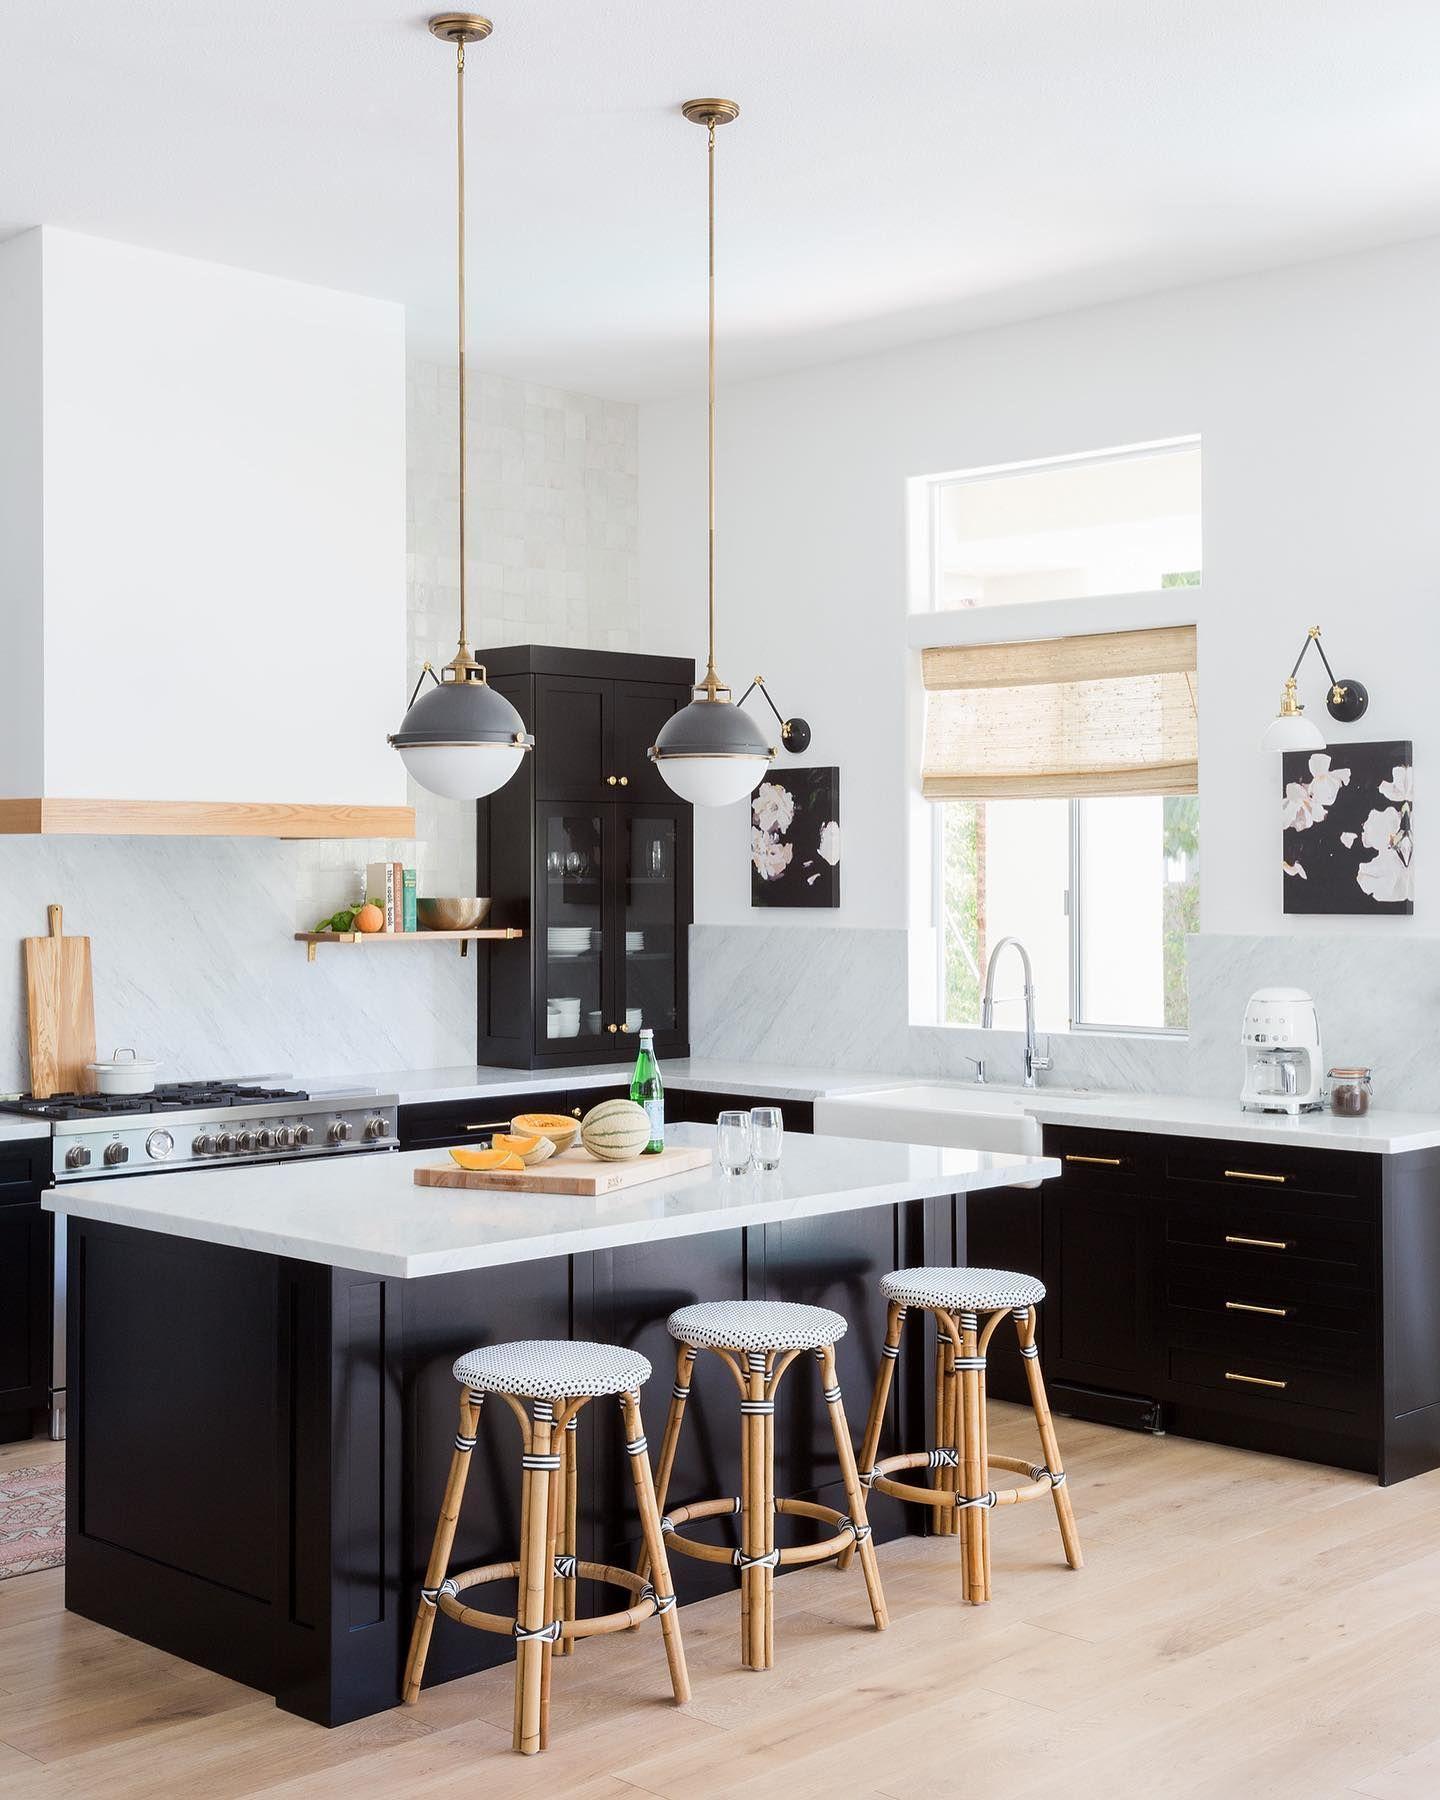 Riviera Backless Counter Stool Black Kitchen Cabinets Kitchen Design Kitchen Renovation